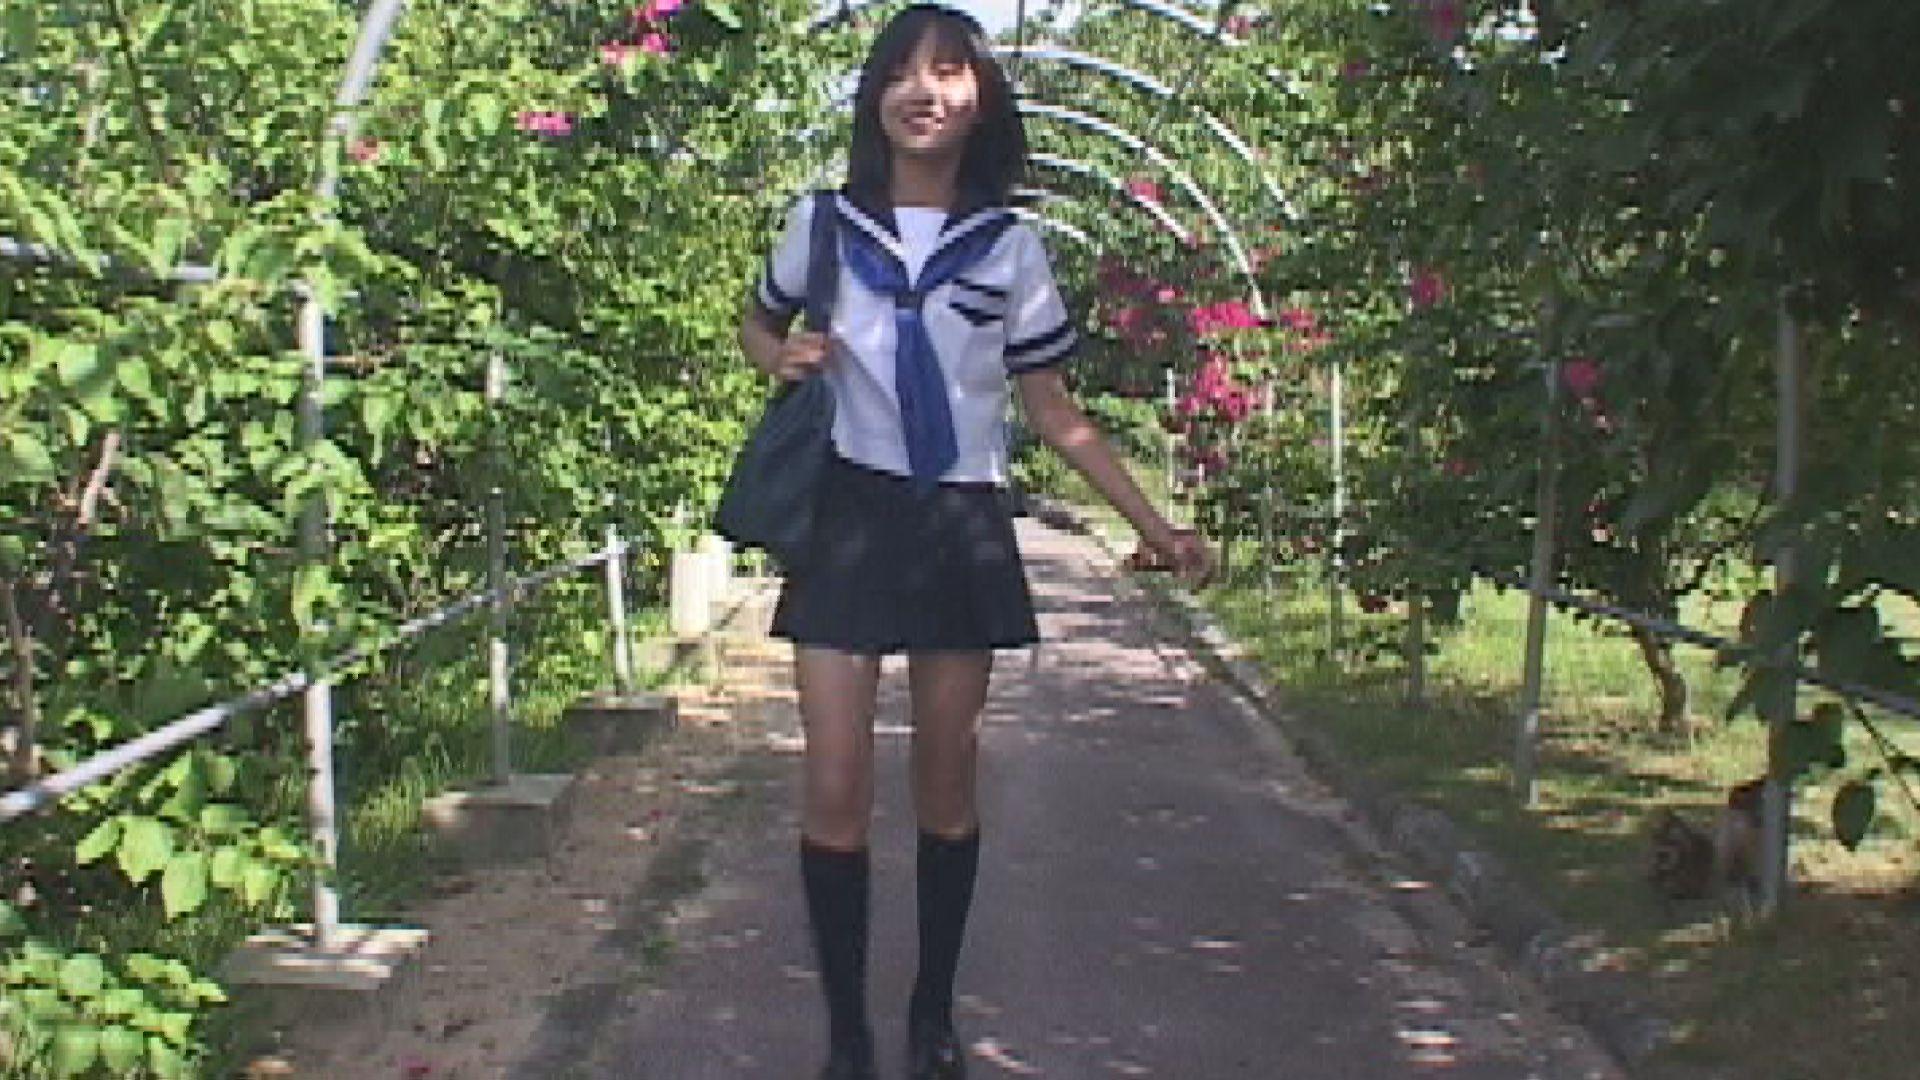 mayumi vol.1 / まゆみ 8